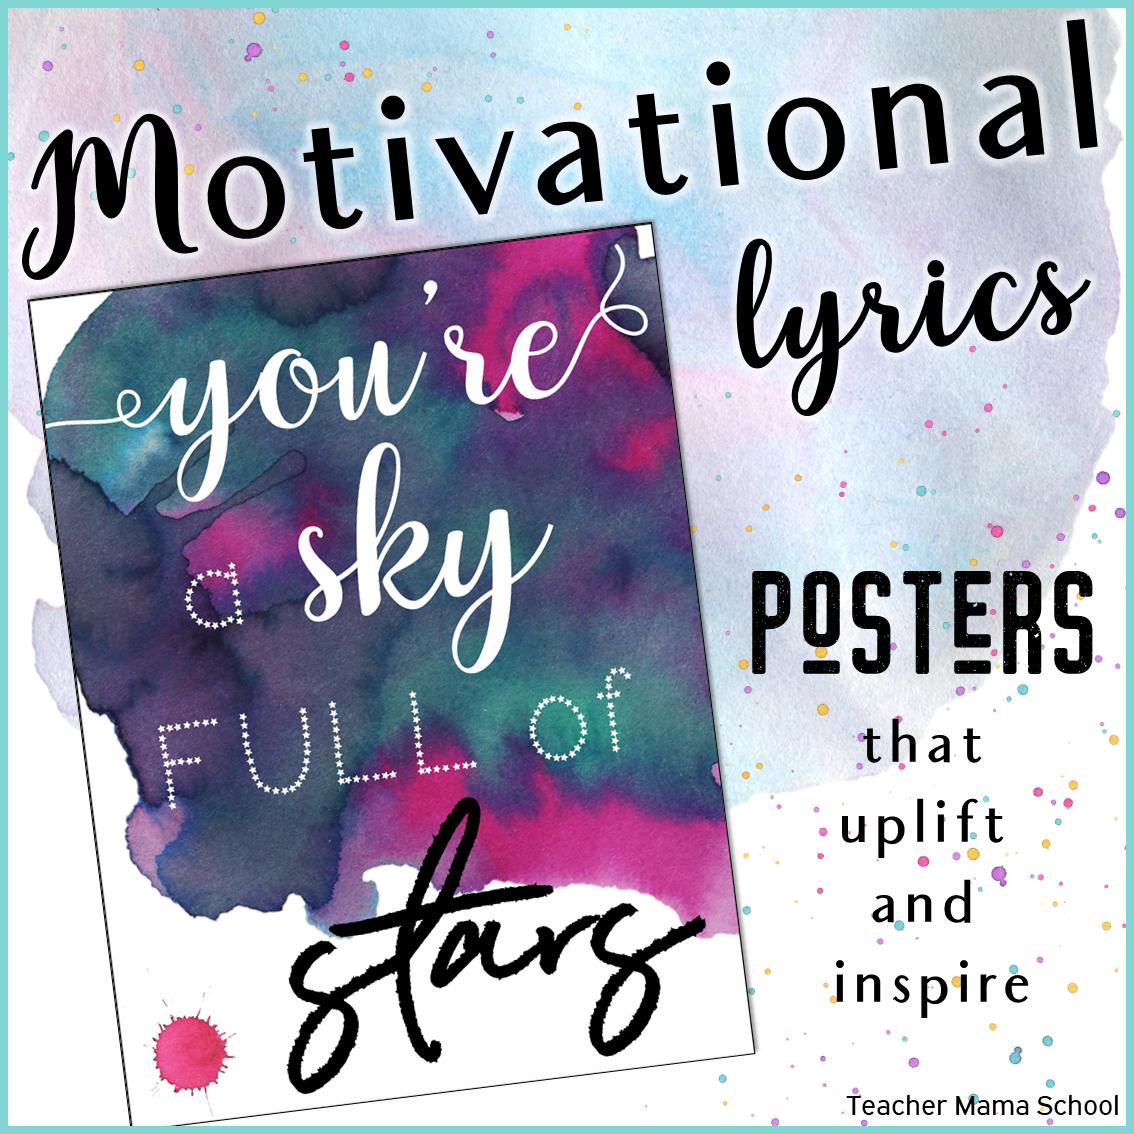 Motivational Lyrics Quotes Posters